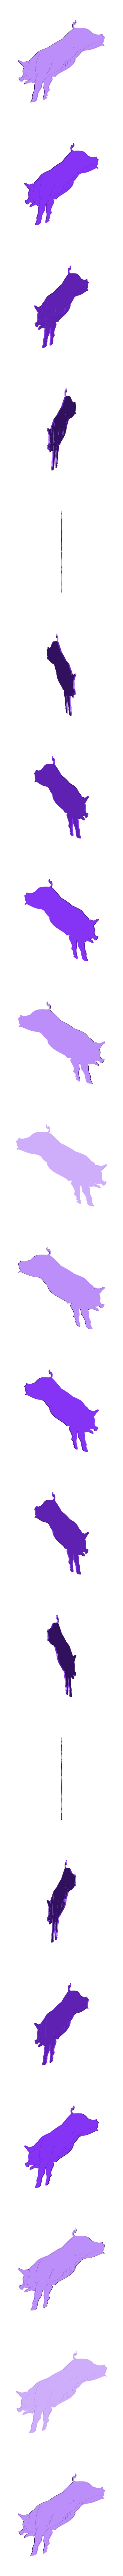 Pig.stl Download free STL file Metaphor • 3D printing template, JayOmega